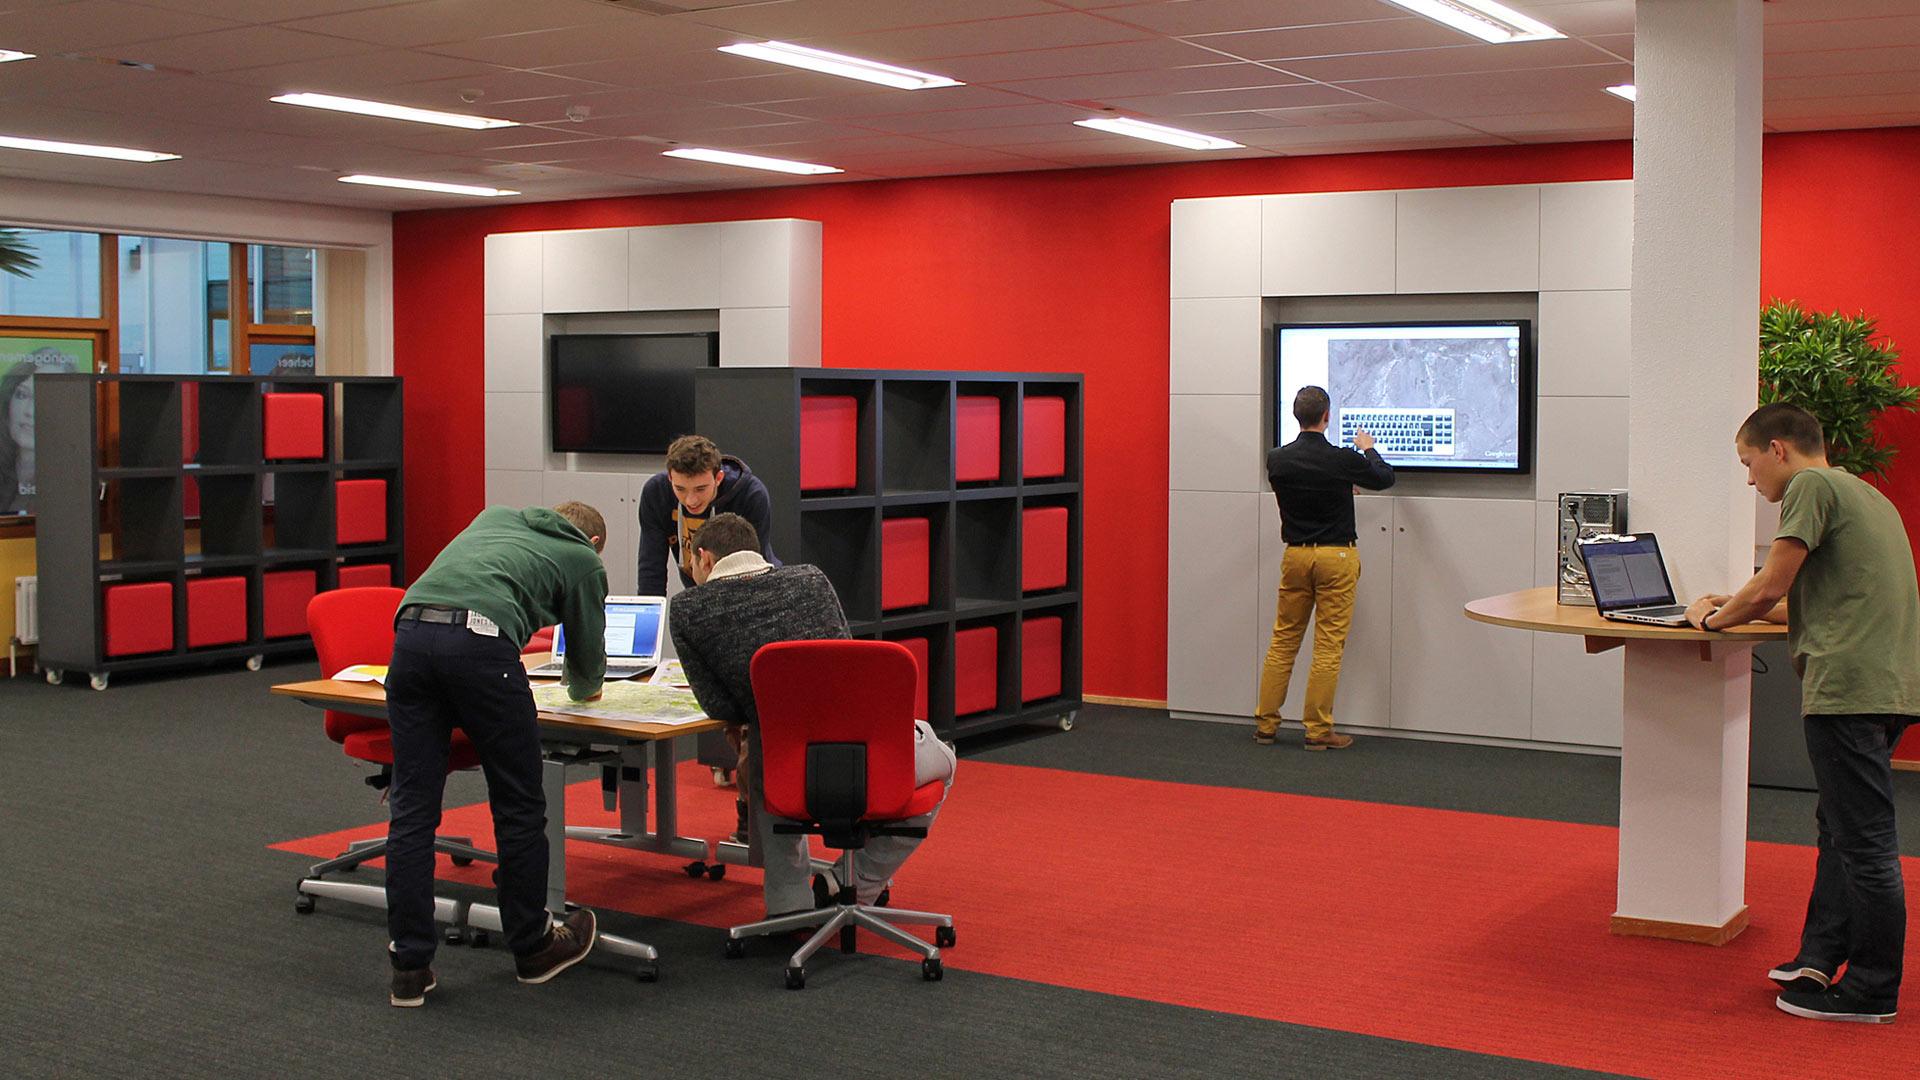 Interne Verbouwing HAS Hogeschool Den Bosch